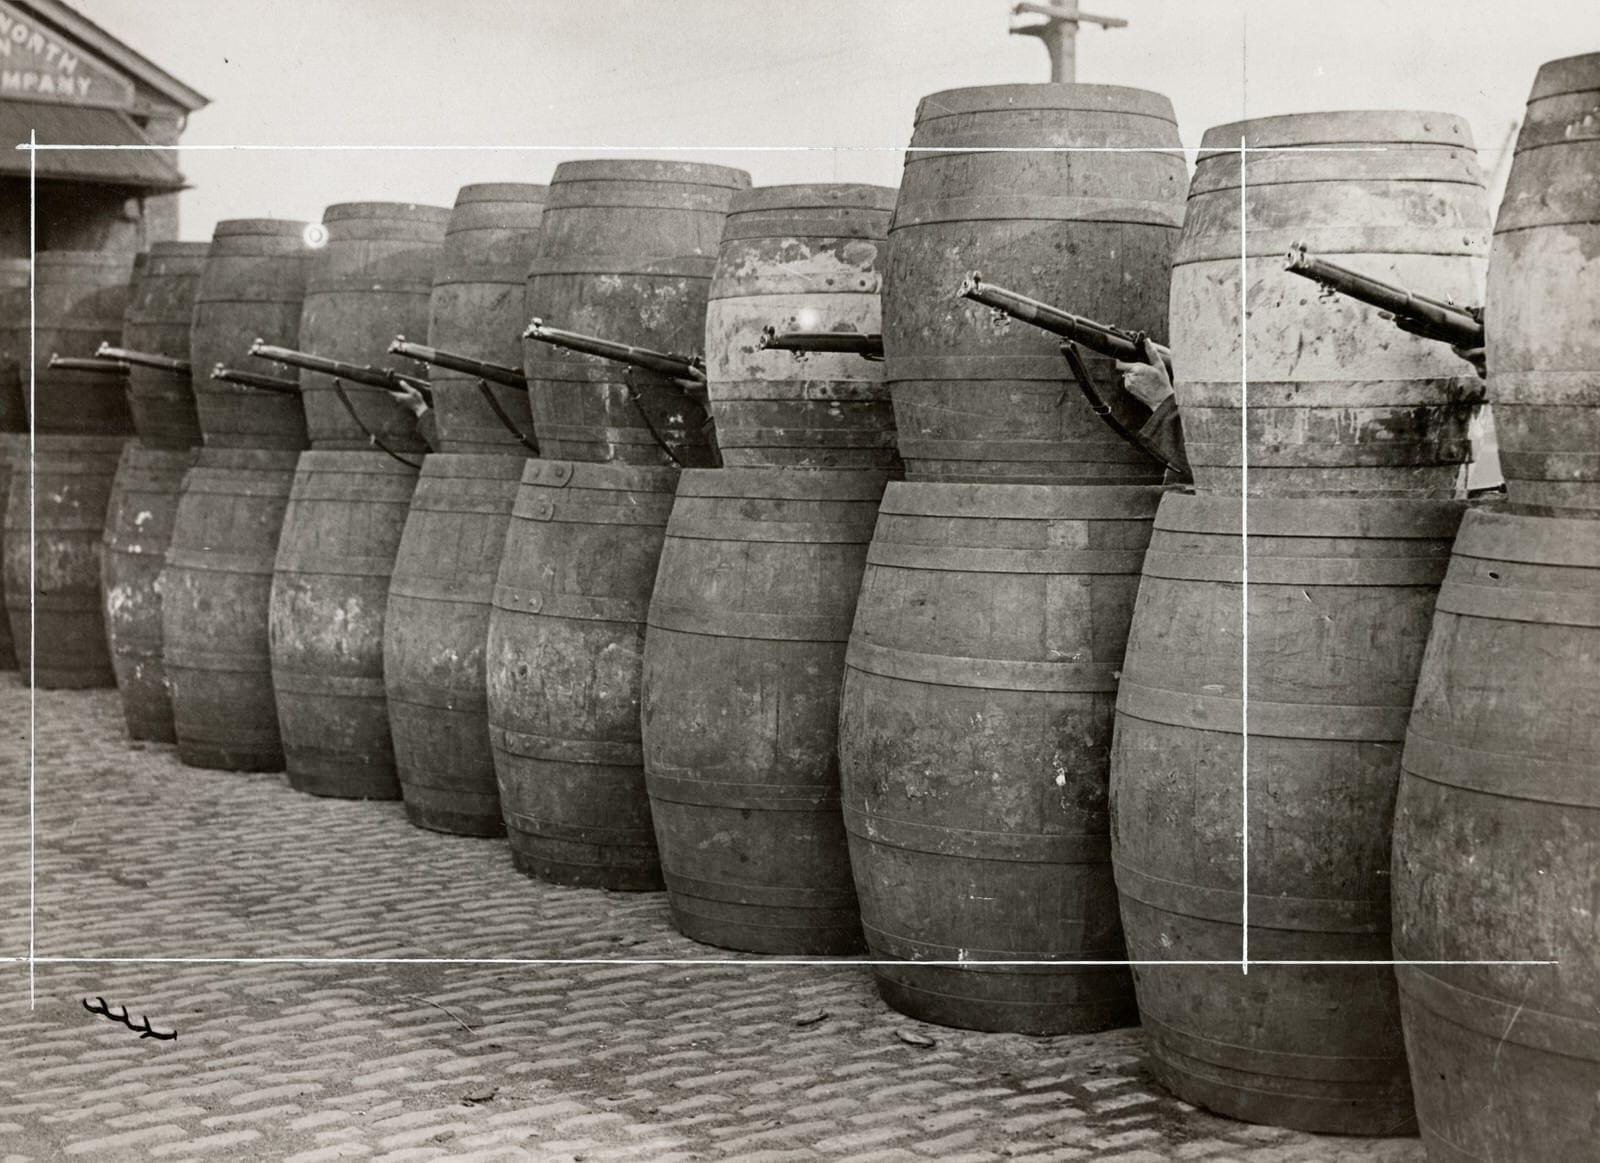 Historic photojournalism depicting the growth of Irish nationalism